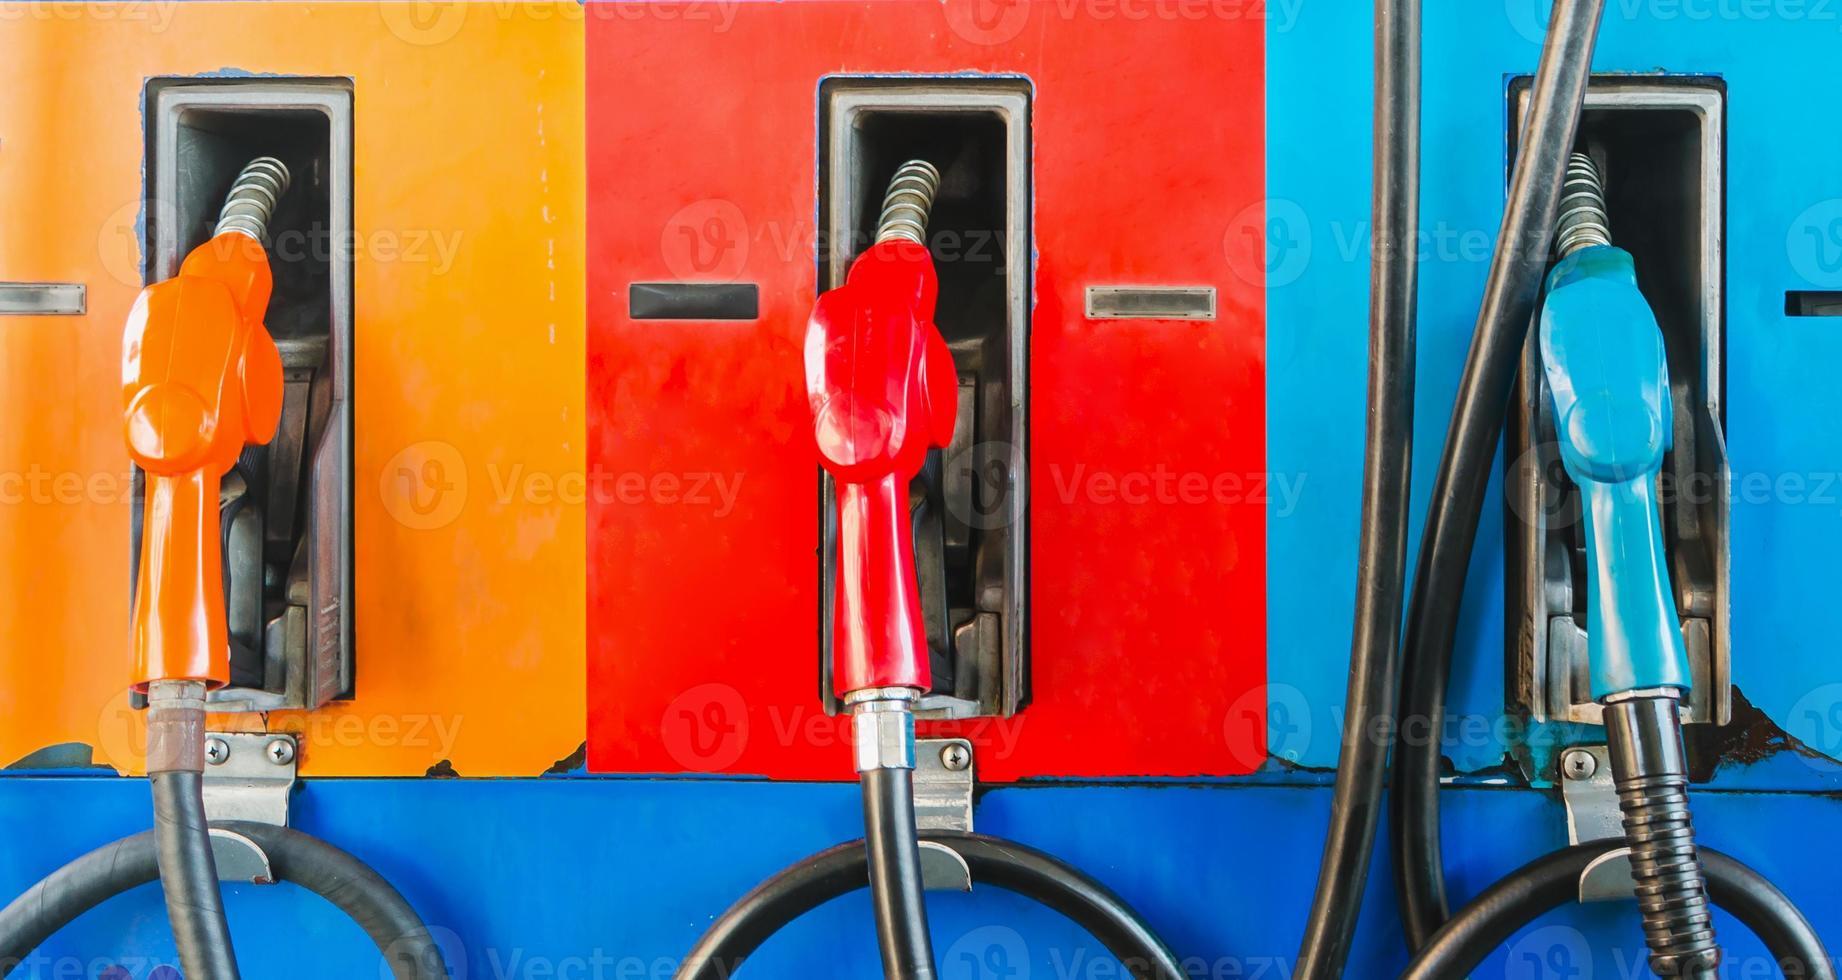 benzine dispenser foto